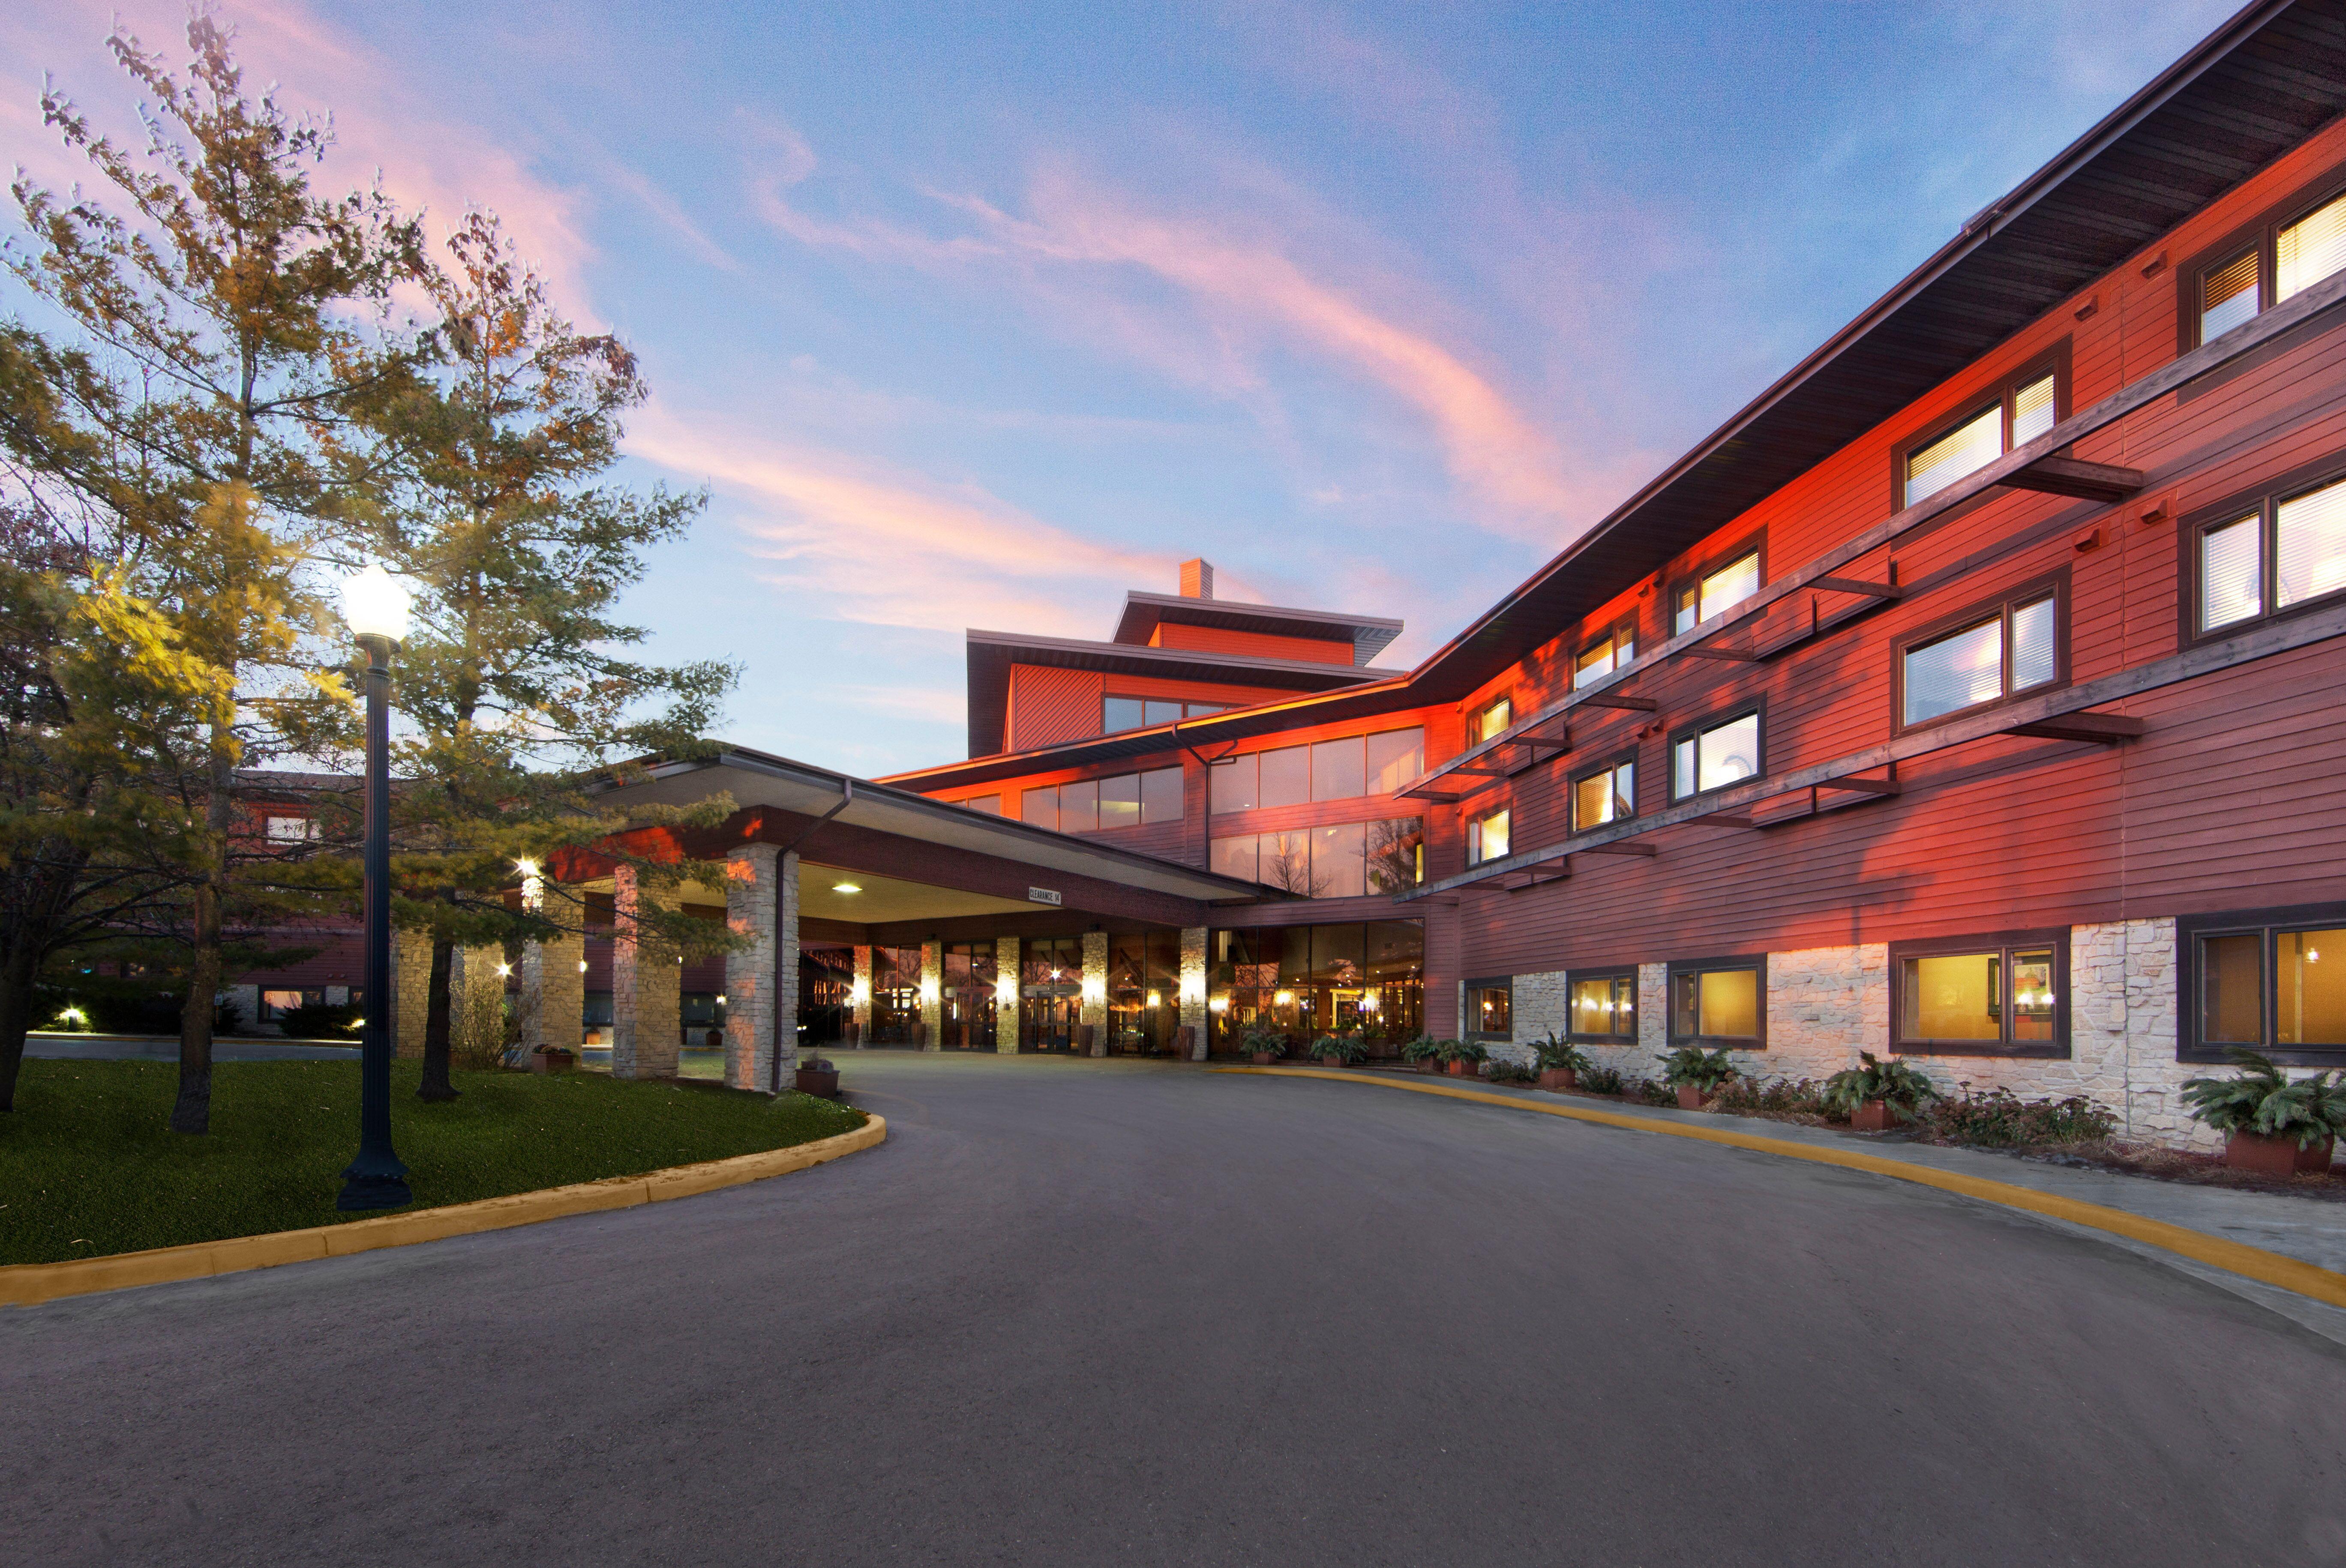 Radisson Hotel Amp Conference Center Green Bay Green Bay Wi